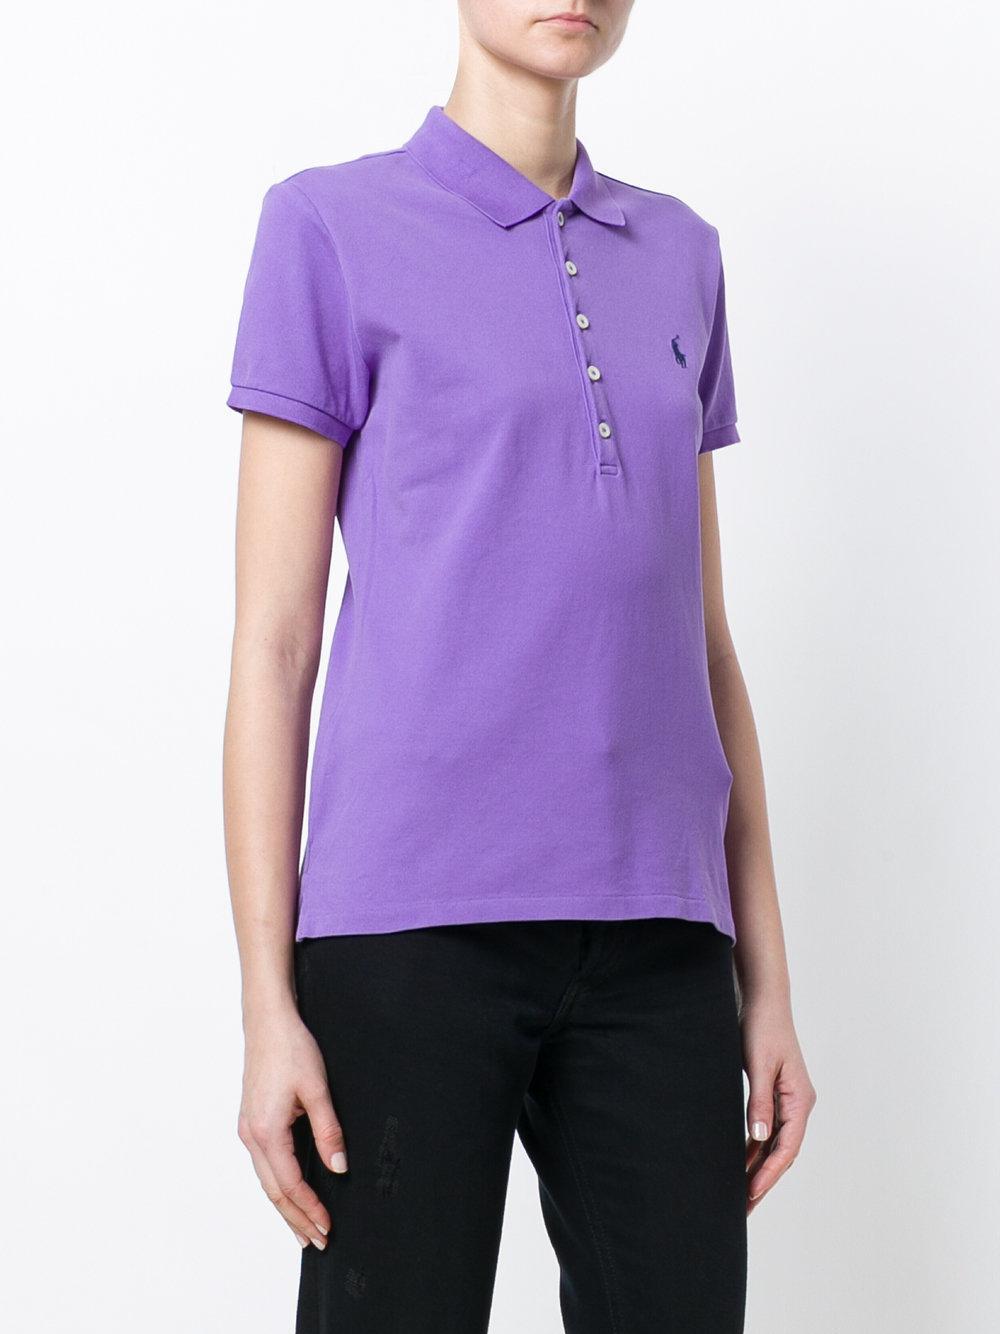 polo ralph lauren slim fit polo shirt in purple lyst. Black Bedroom Furniture Sets. Home Design Ideas